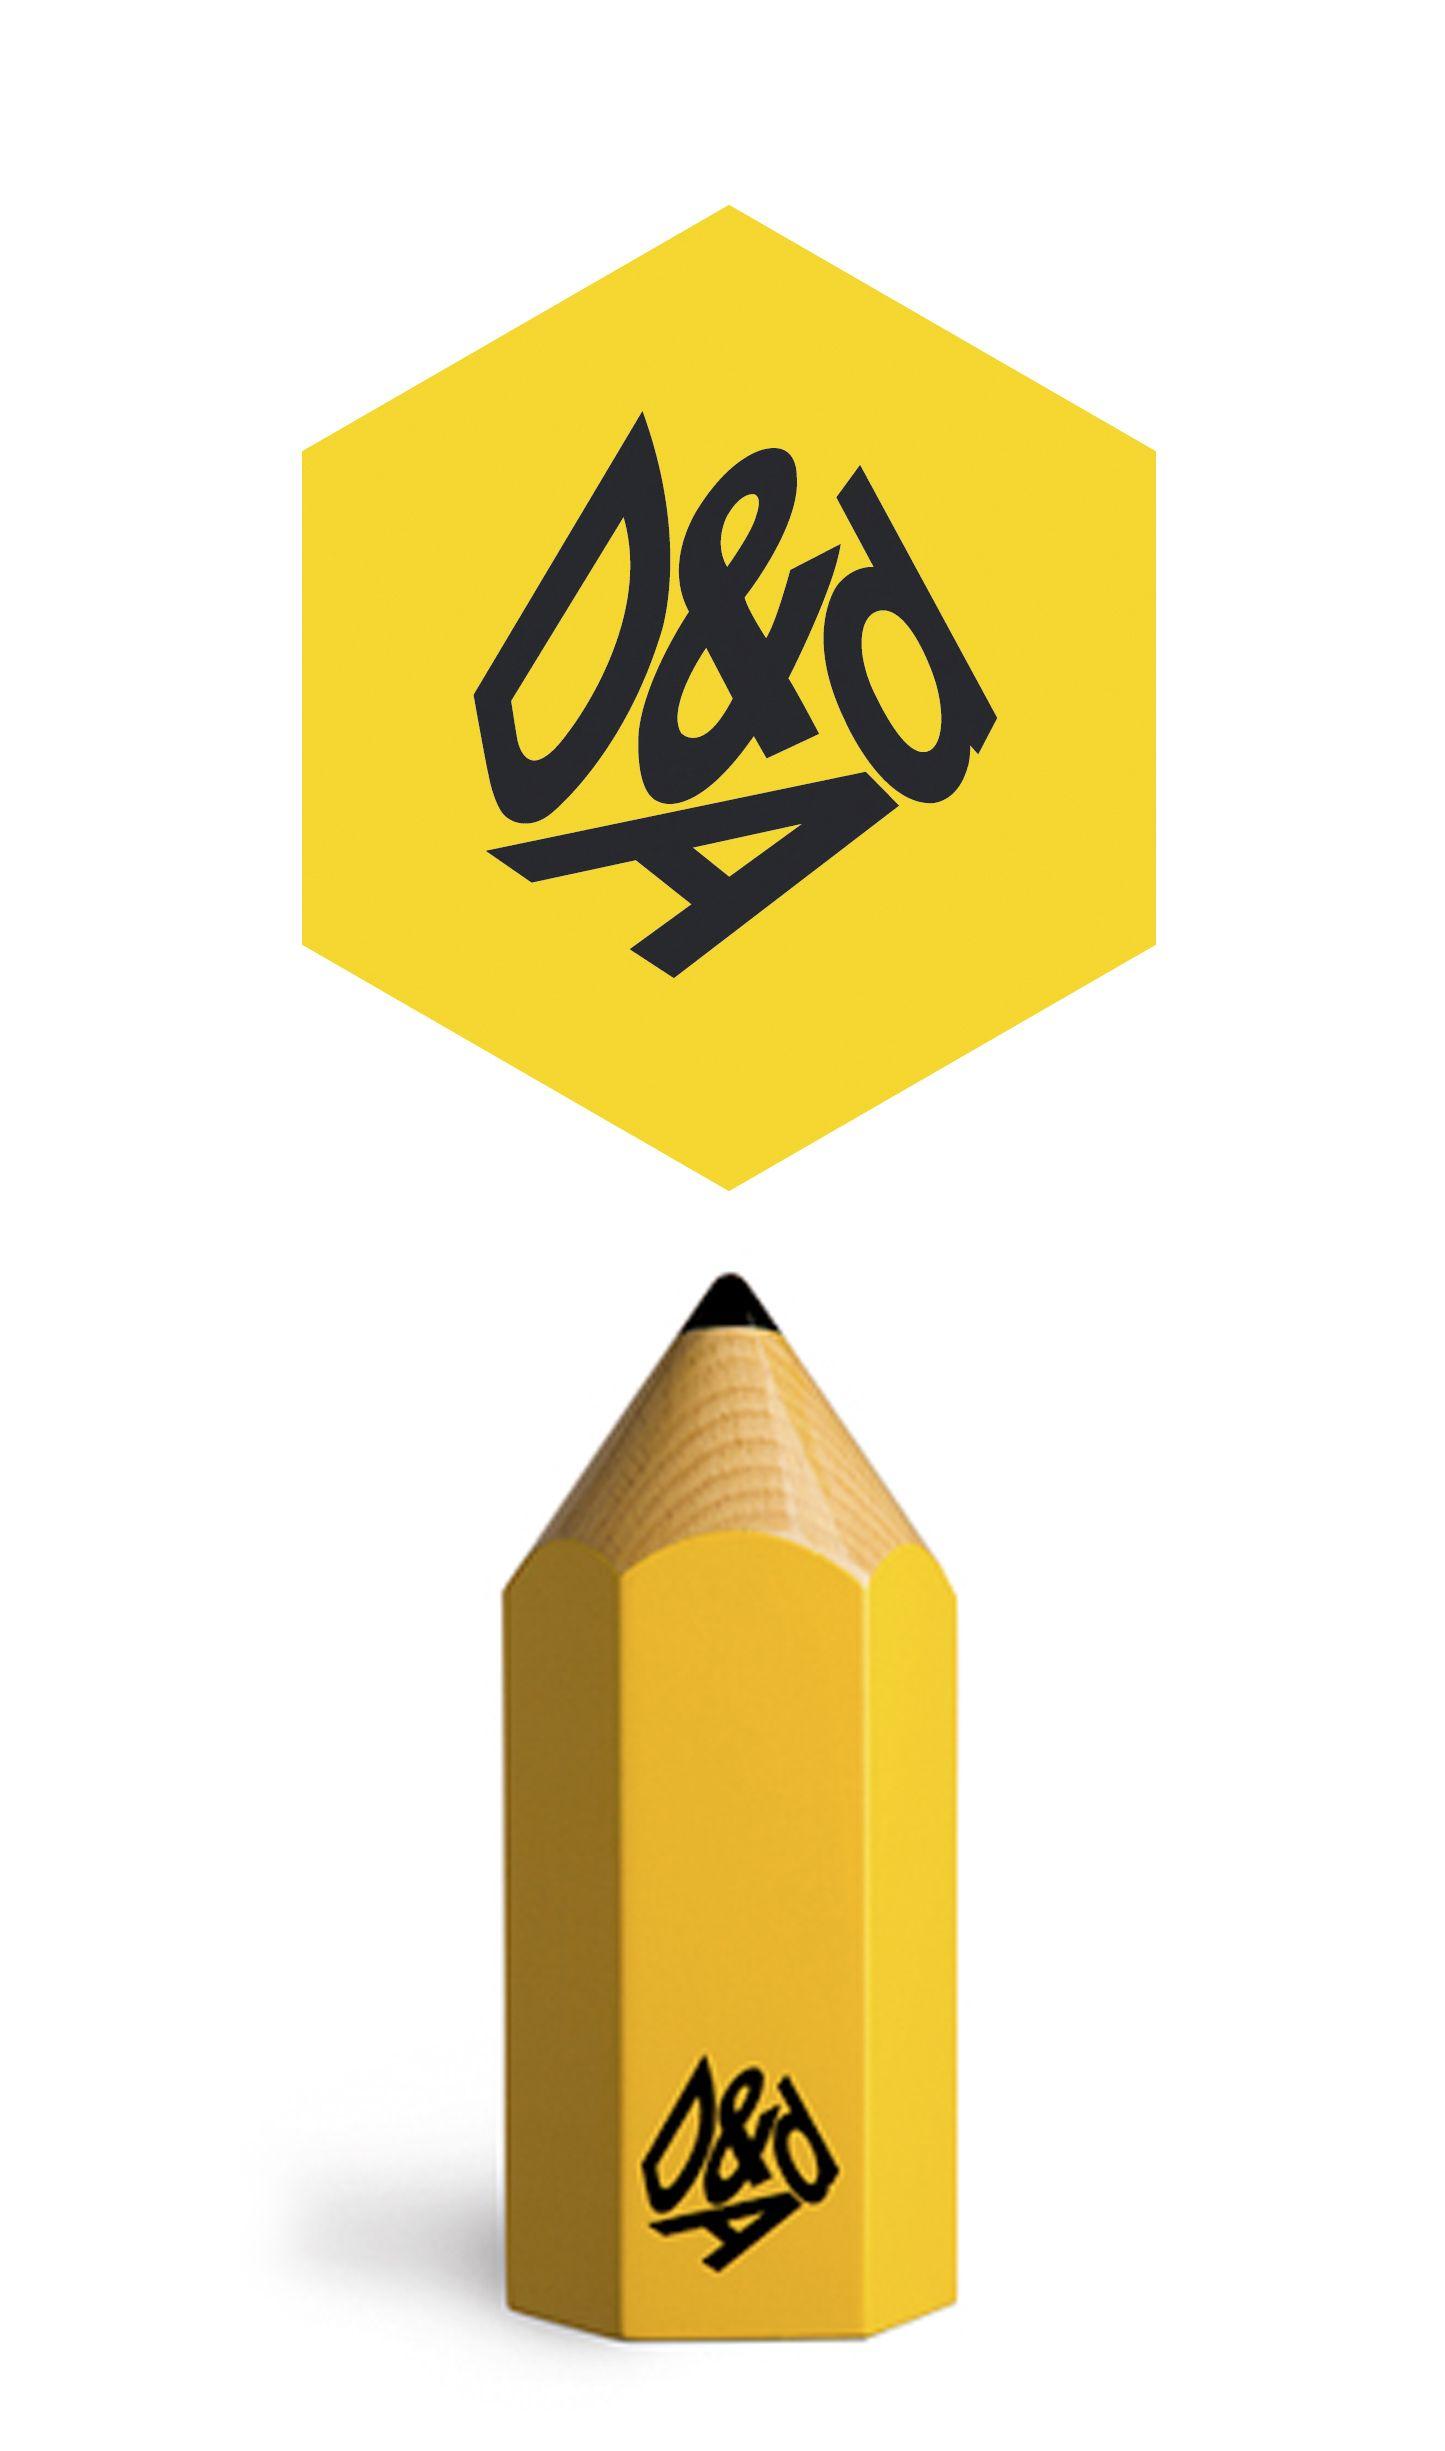 The D&AD (Design & Art Direction) Awards use a hexagon shape as.